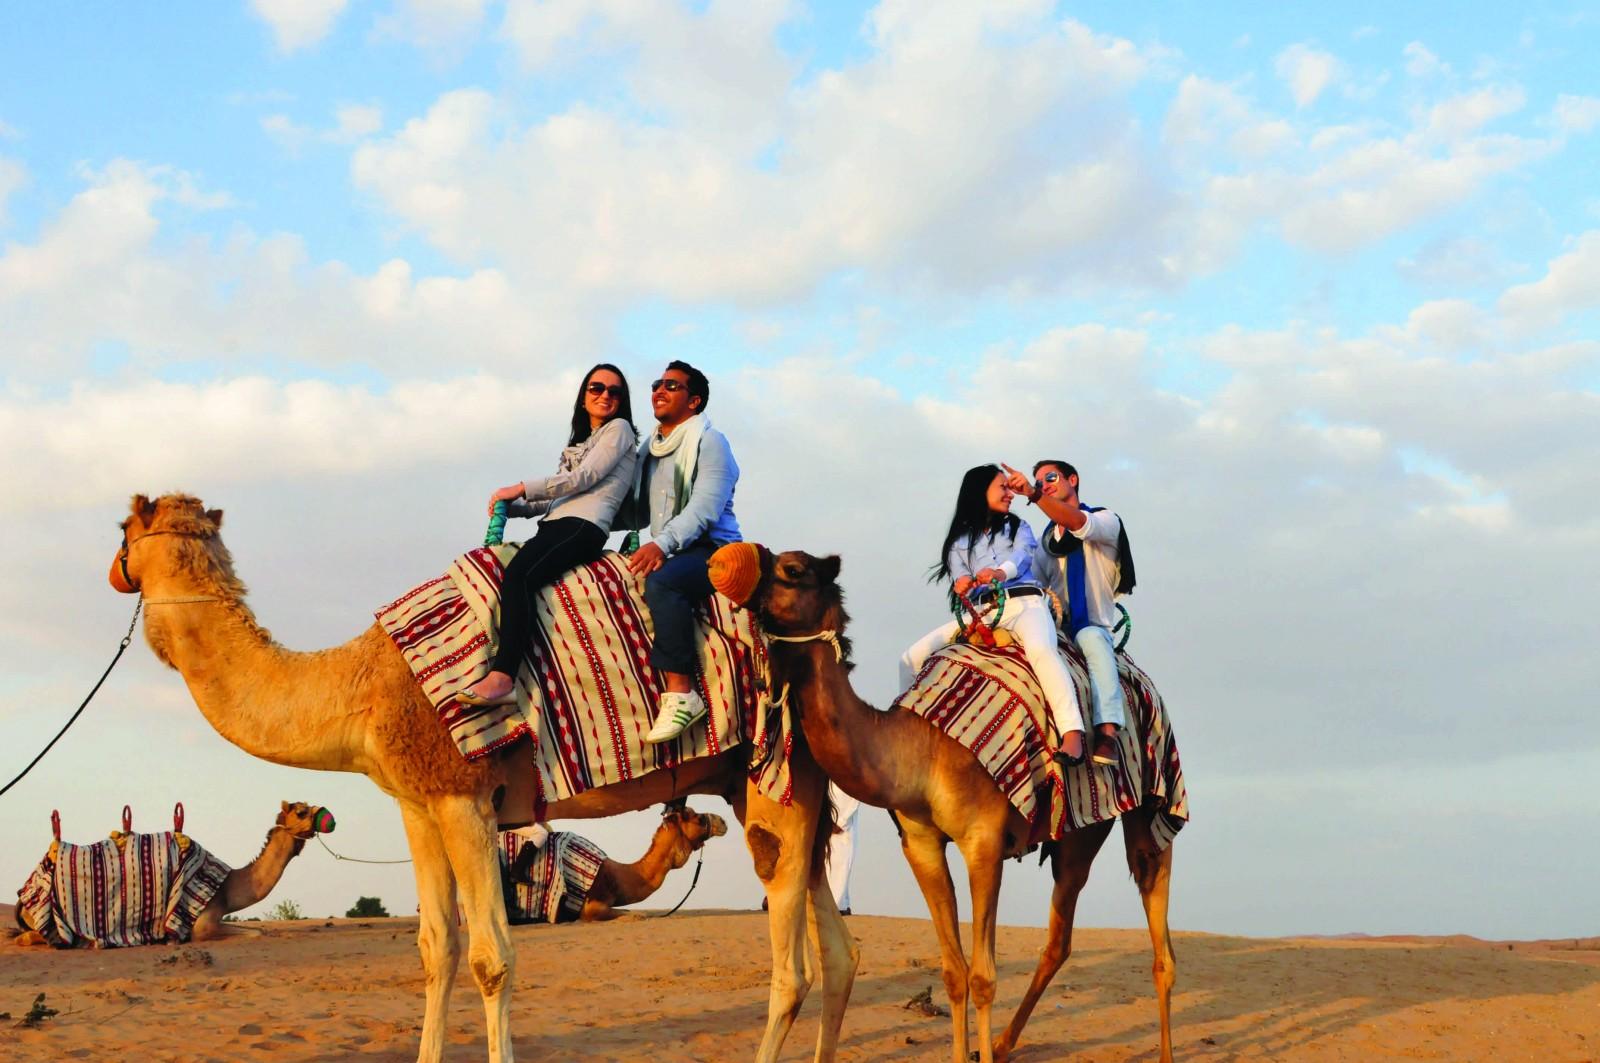 Sundowner Safari, Dhabi, Emirates, Supplier Photo (Exeter)